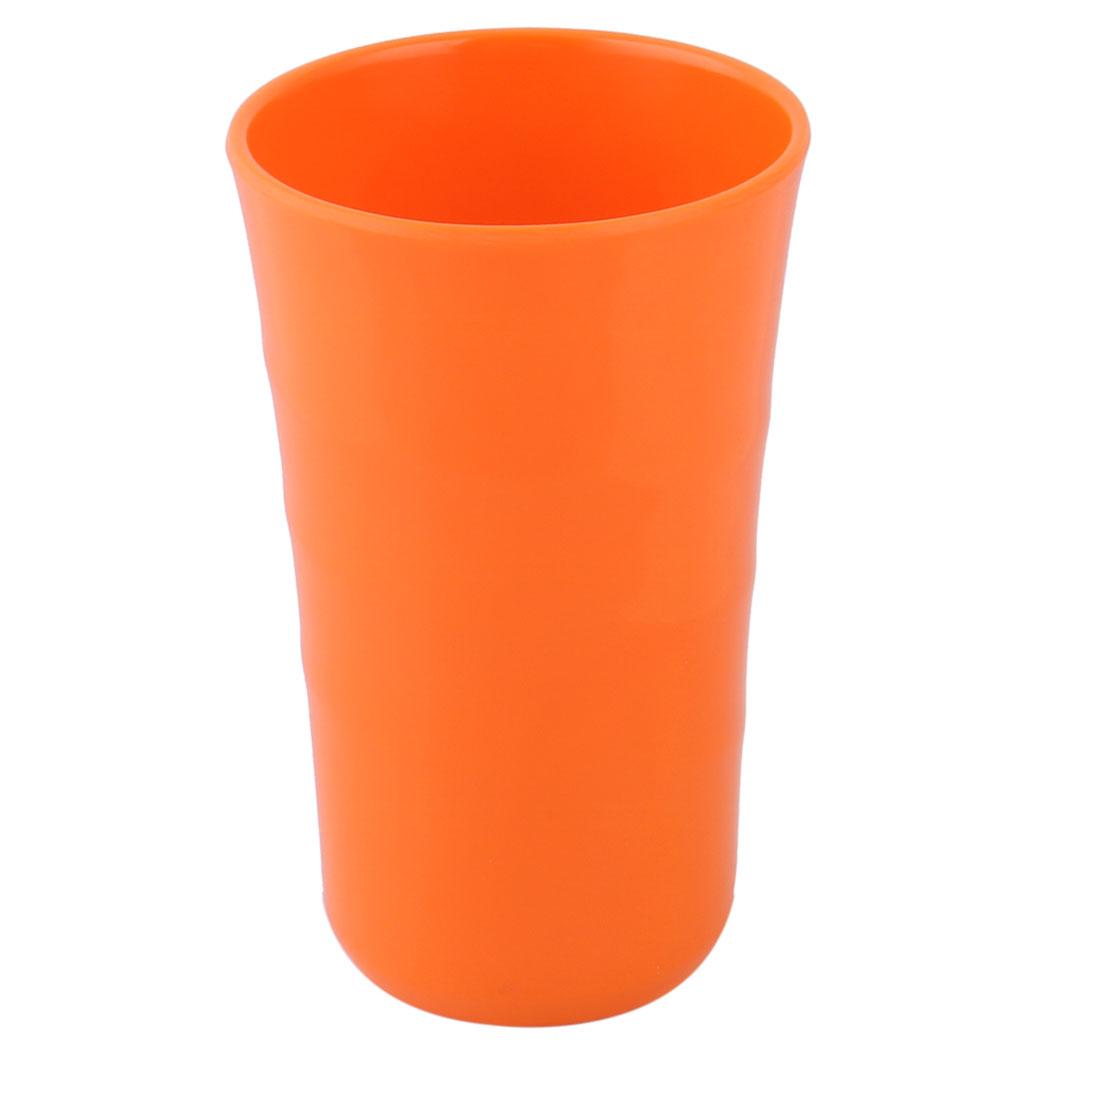 Home Office Melamine Round Coffee Tea Water Juice Drinking Cup Mug Orange 400ml